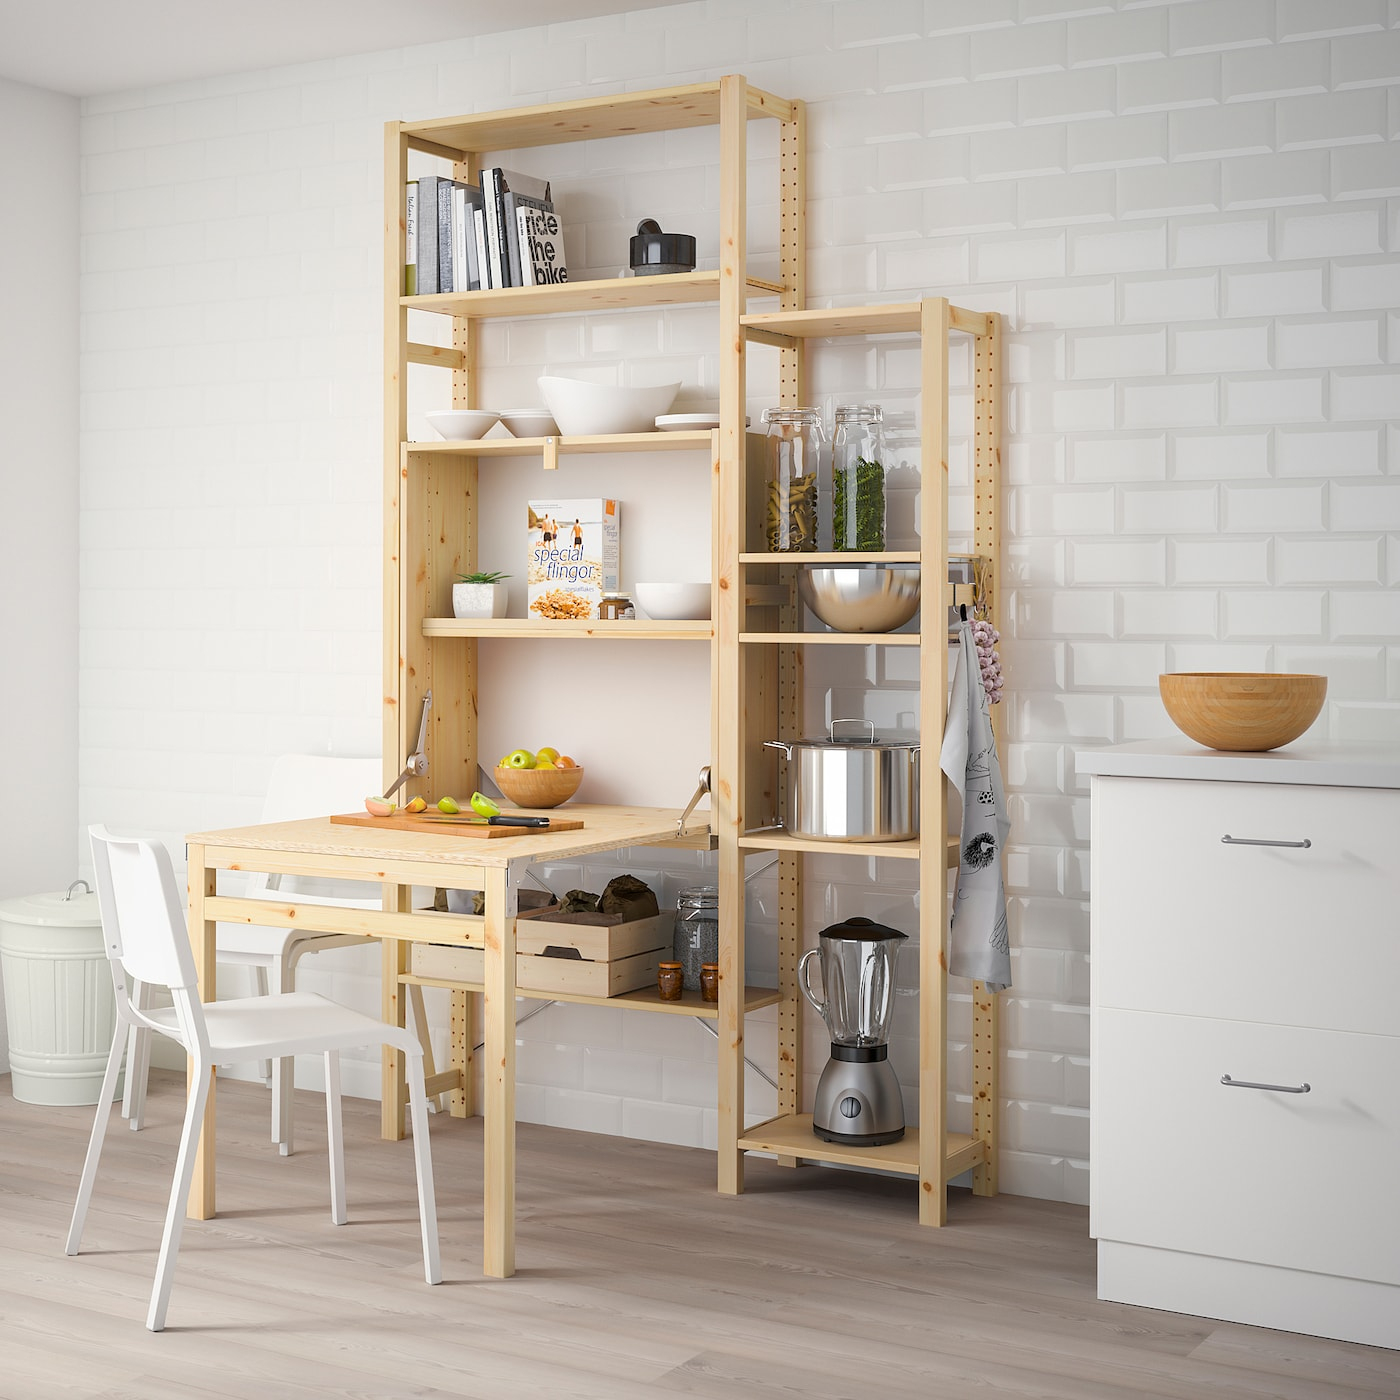 Ivar 2 Sections/rgt Av Table Pliante 134X30-104X226 Cm destiné Table Salle A Manger Pliante Ikea